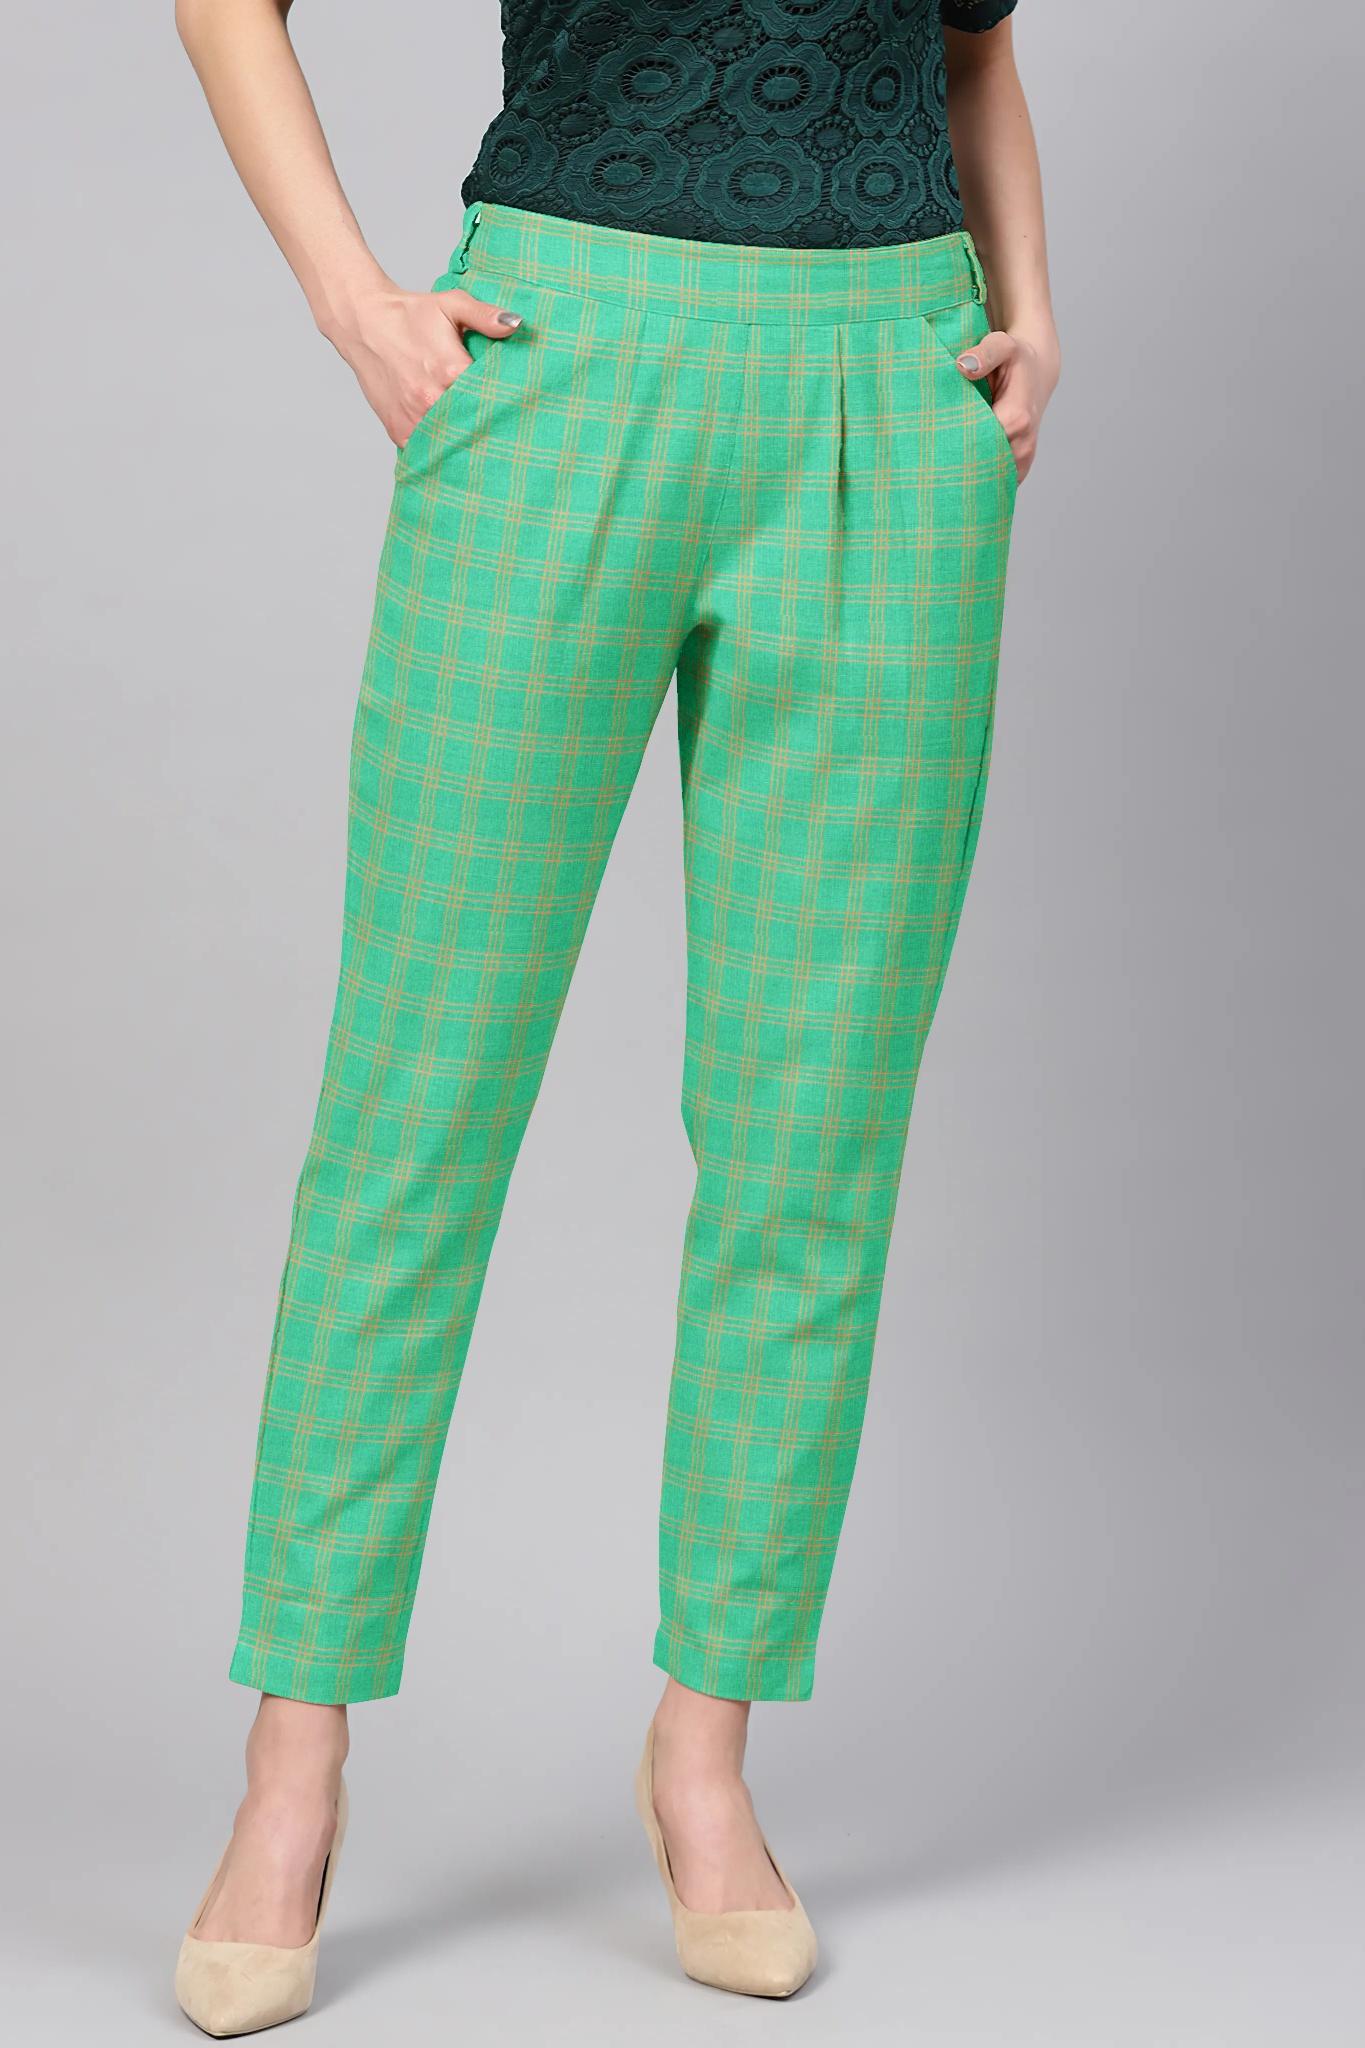 /home/customer/www/fabartcraft.com/public_html/uploadshttps://www.shopolics.com/uploads/images/medium/Green-Golden-Cotton-Check-Regular-Fit-Solid-Trouser-36101.jpg